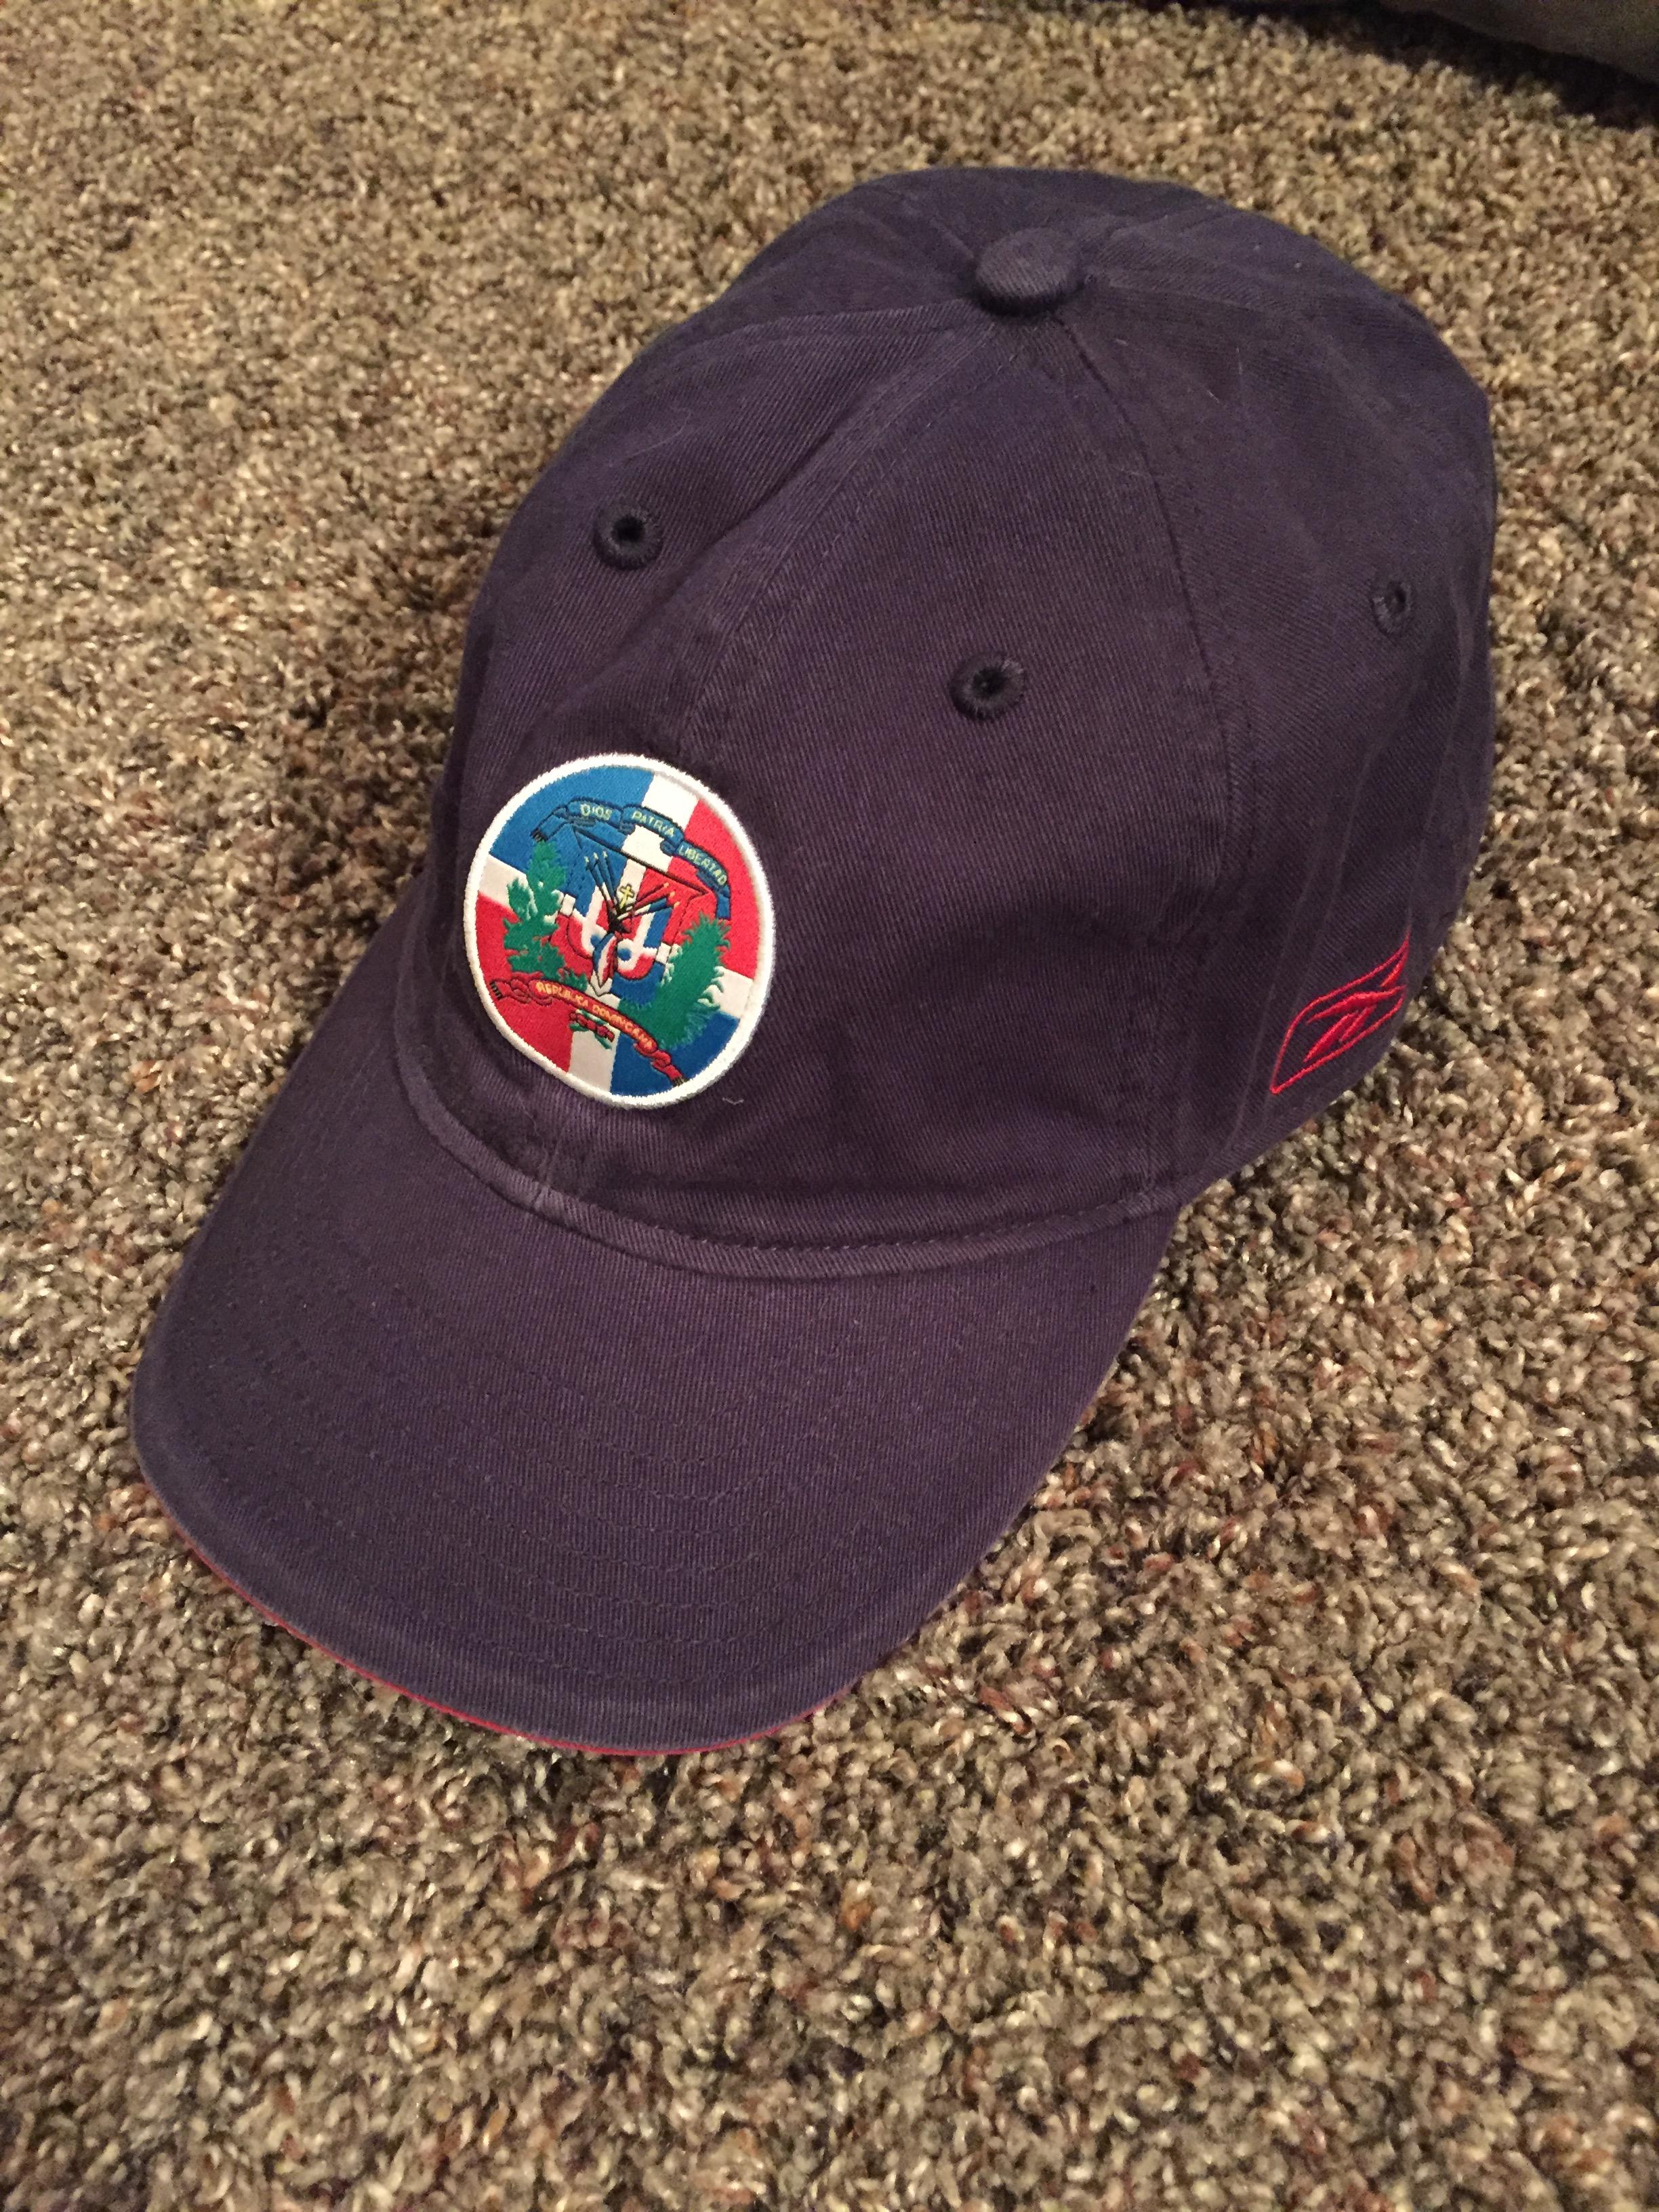 Reebok Reebok Dominican Republic Dad Hat - NEW Size one size - Hats ... 9cefde58cca